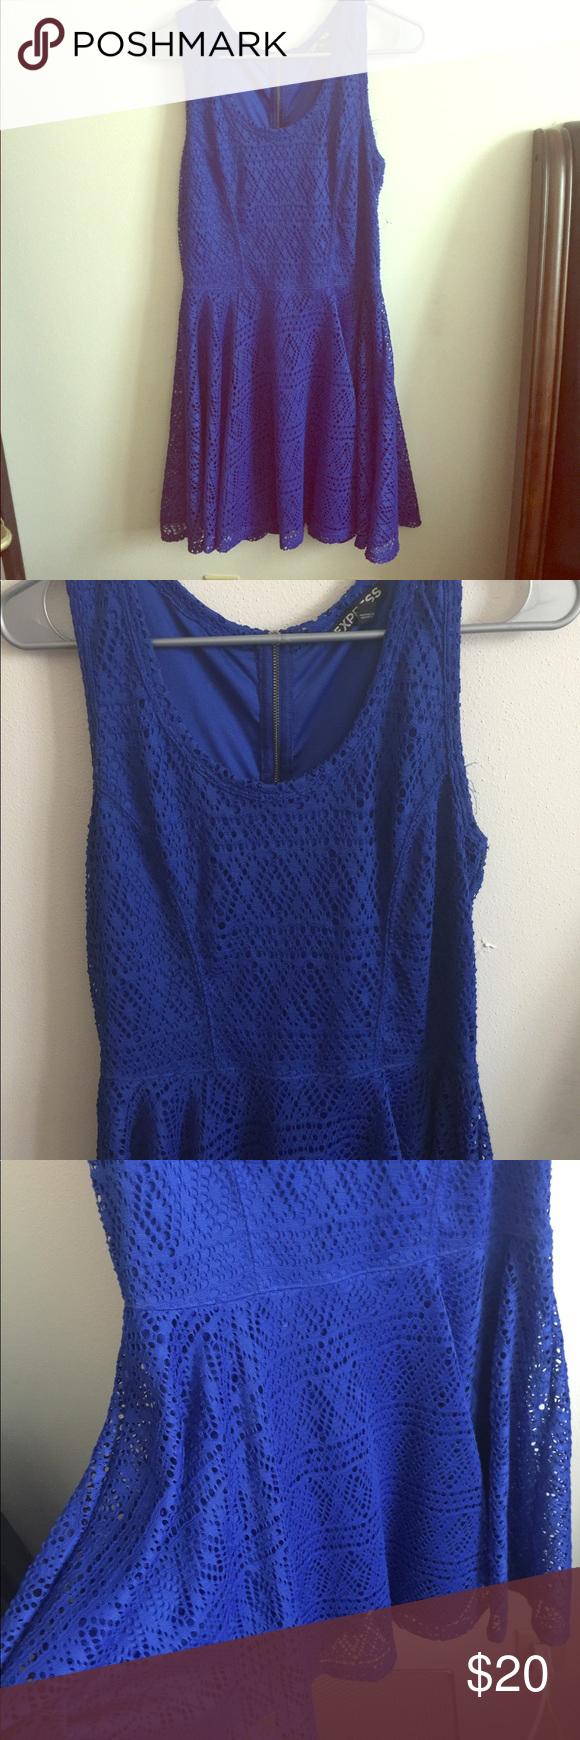 Express bold blue dress blue dresses bald hairstyles and express